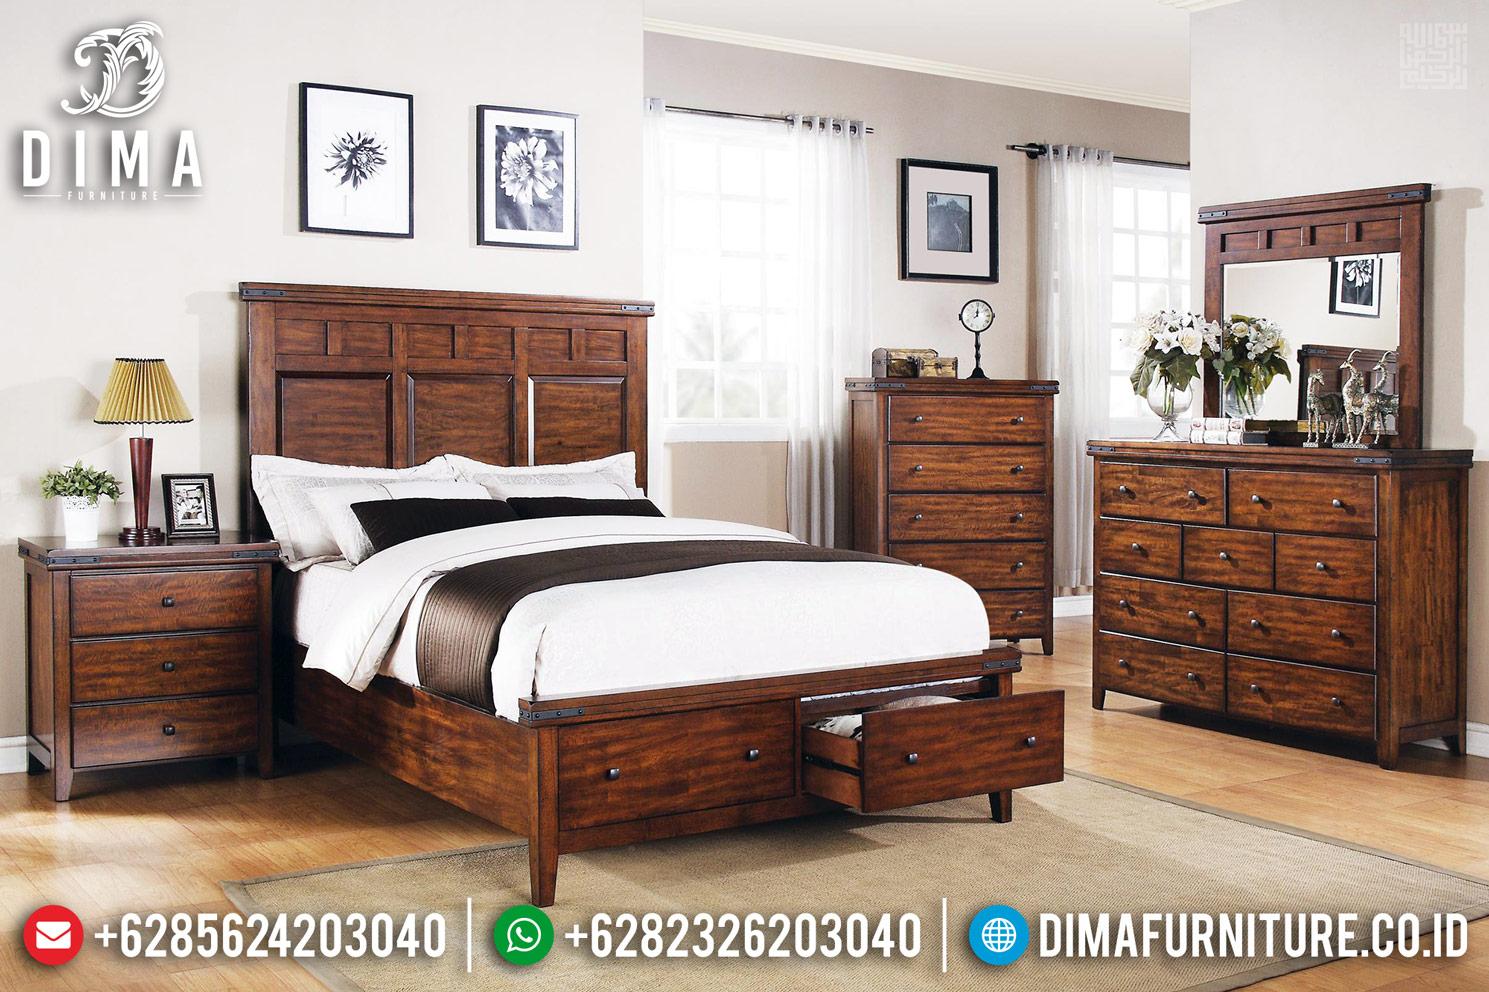 Model Laci Tempat Tidur Minimalis Kayu Jati Furniture Jepara Klasik Ttj 0690 Model ranjang kayu minimalis